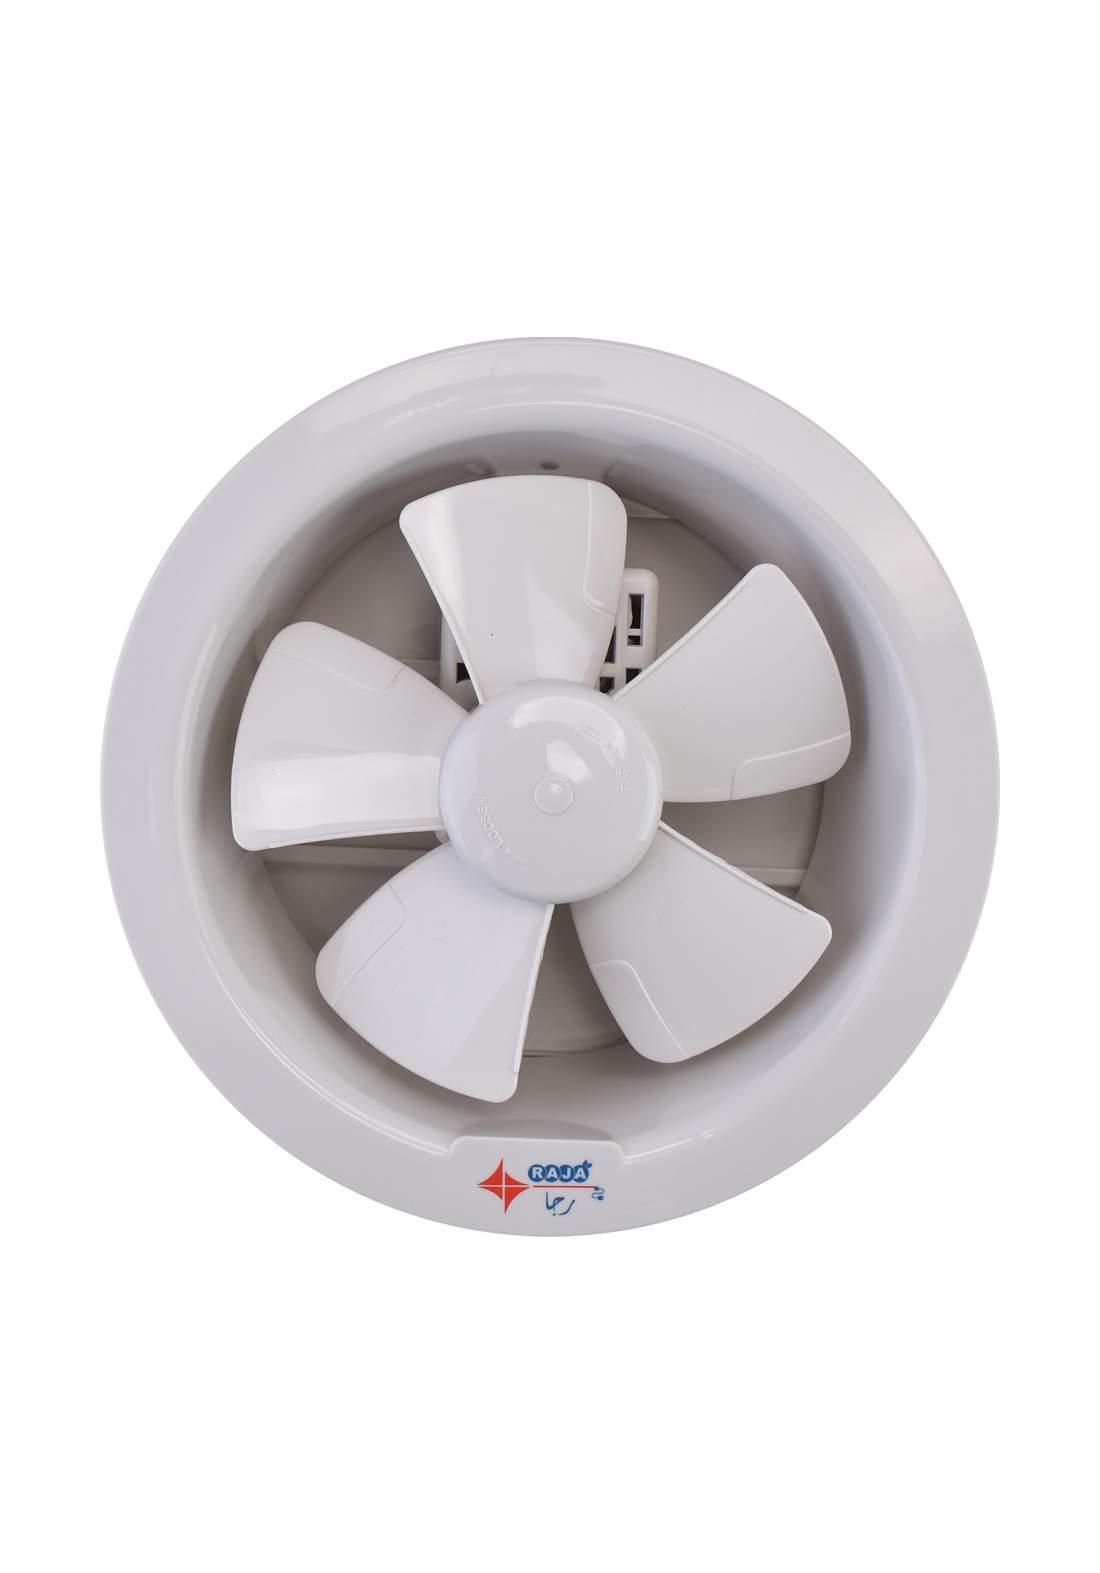 Raja VF-D8GS Ventilating Fans Auto Shutter 20 cm مفرغة هواء